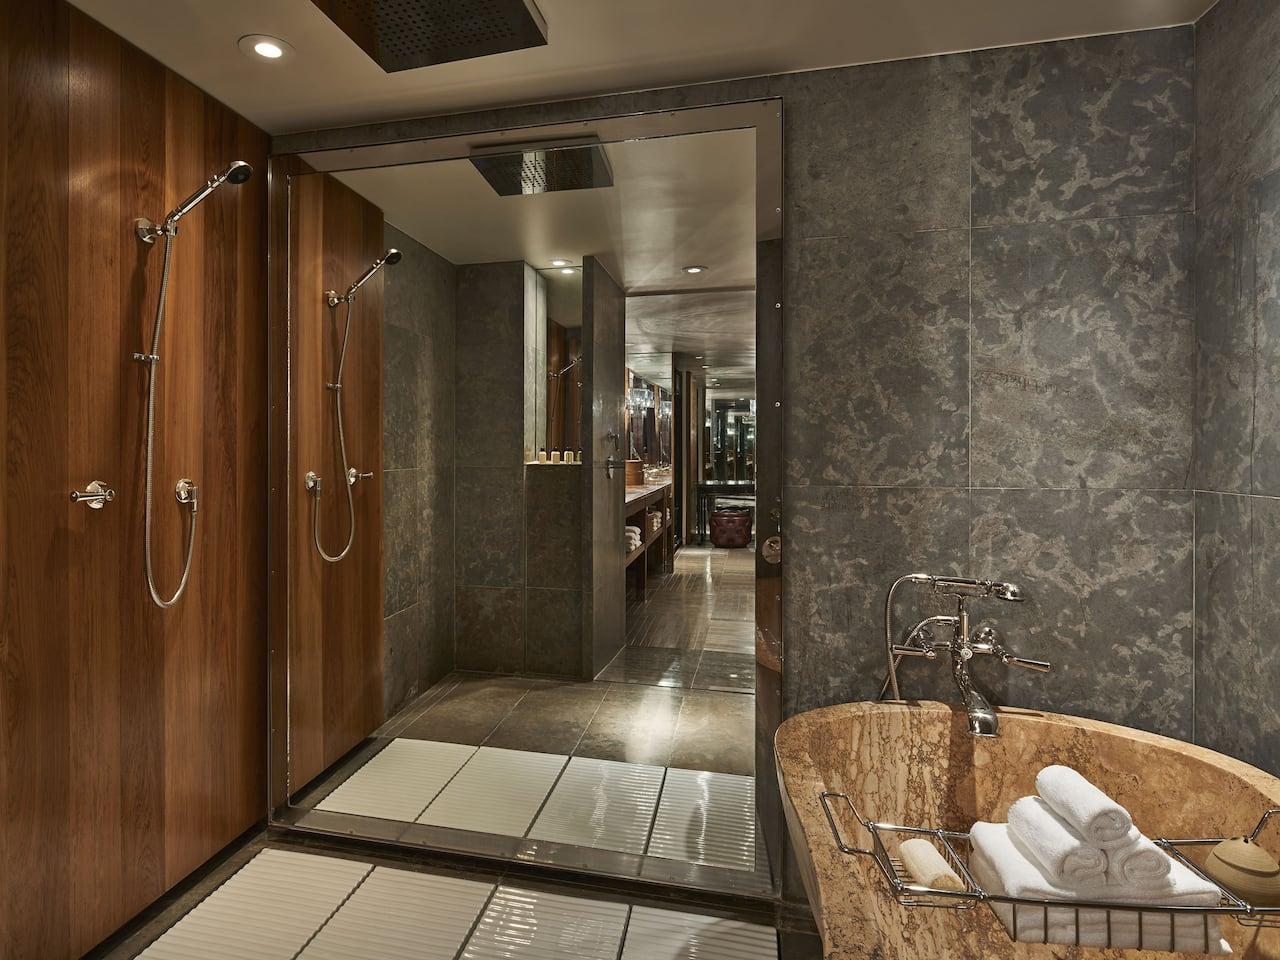 Park Hyatt Washington D.C. Presidential Suite Shower Bathtub